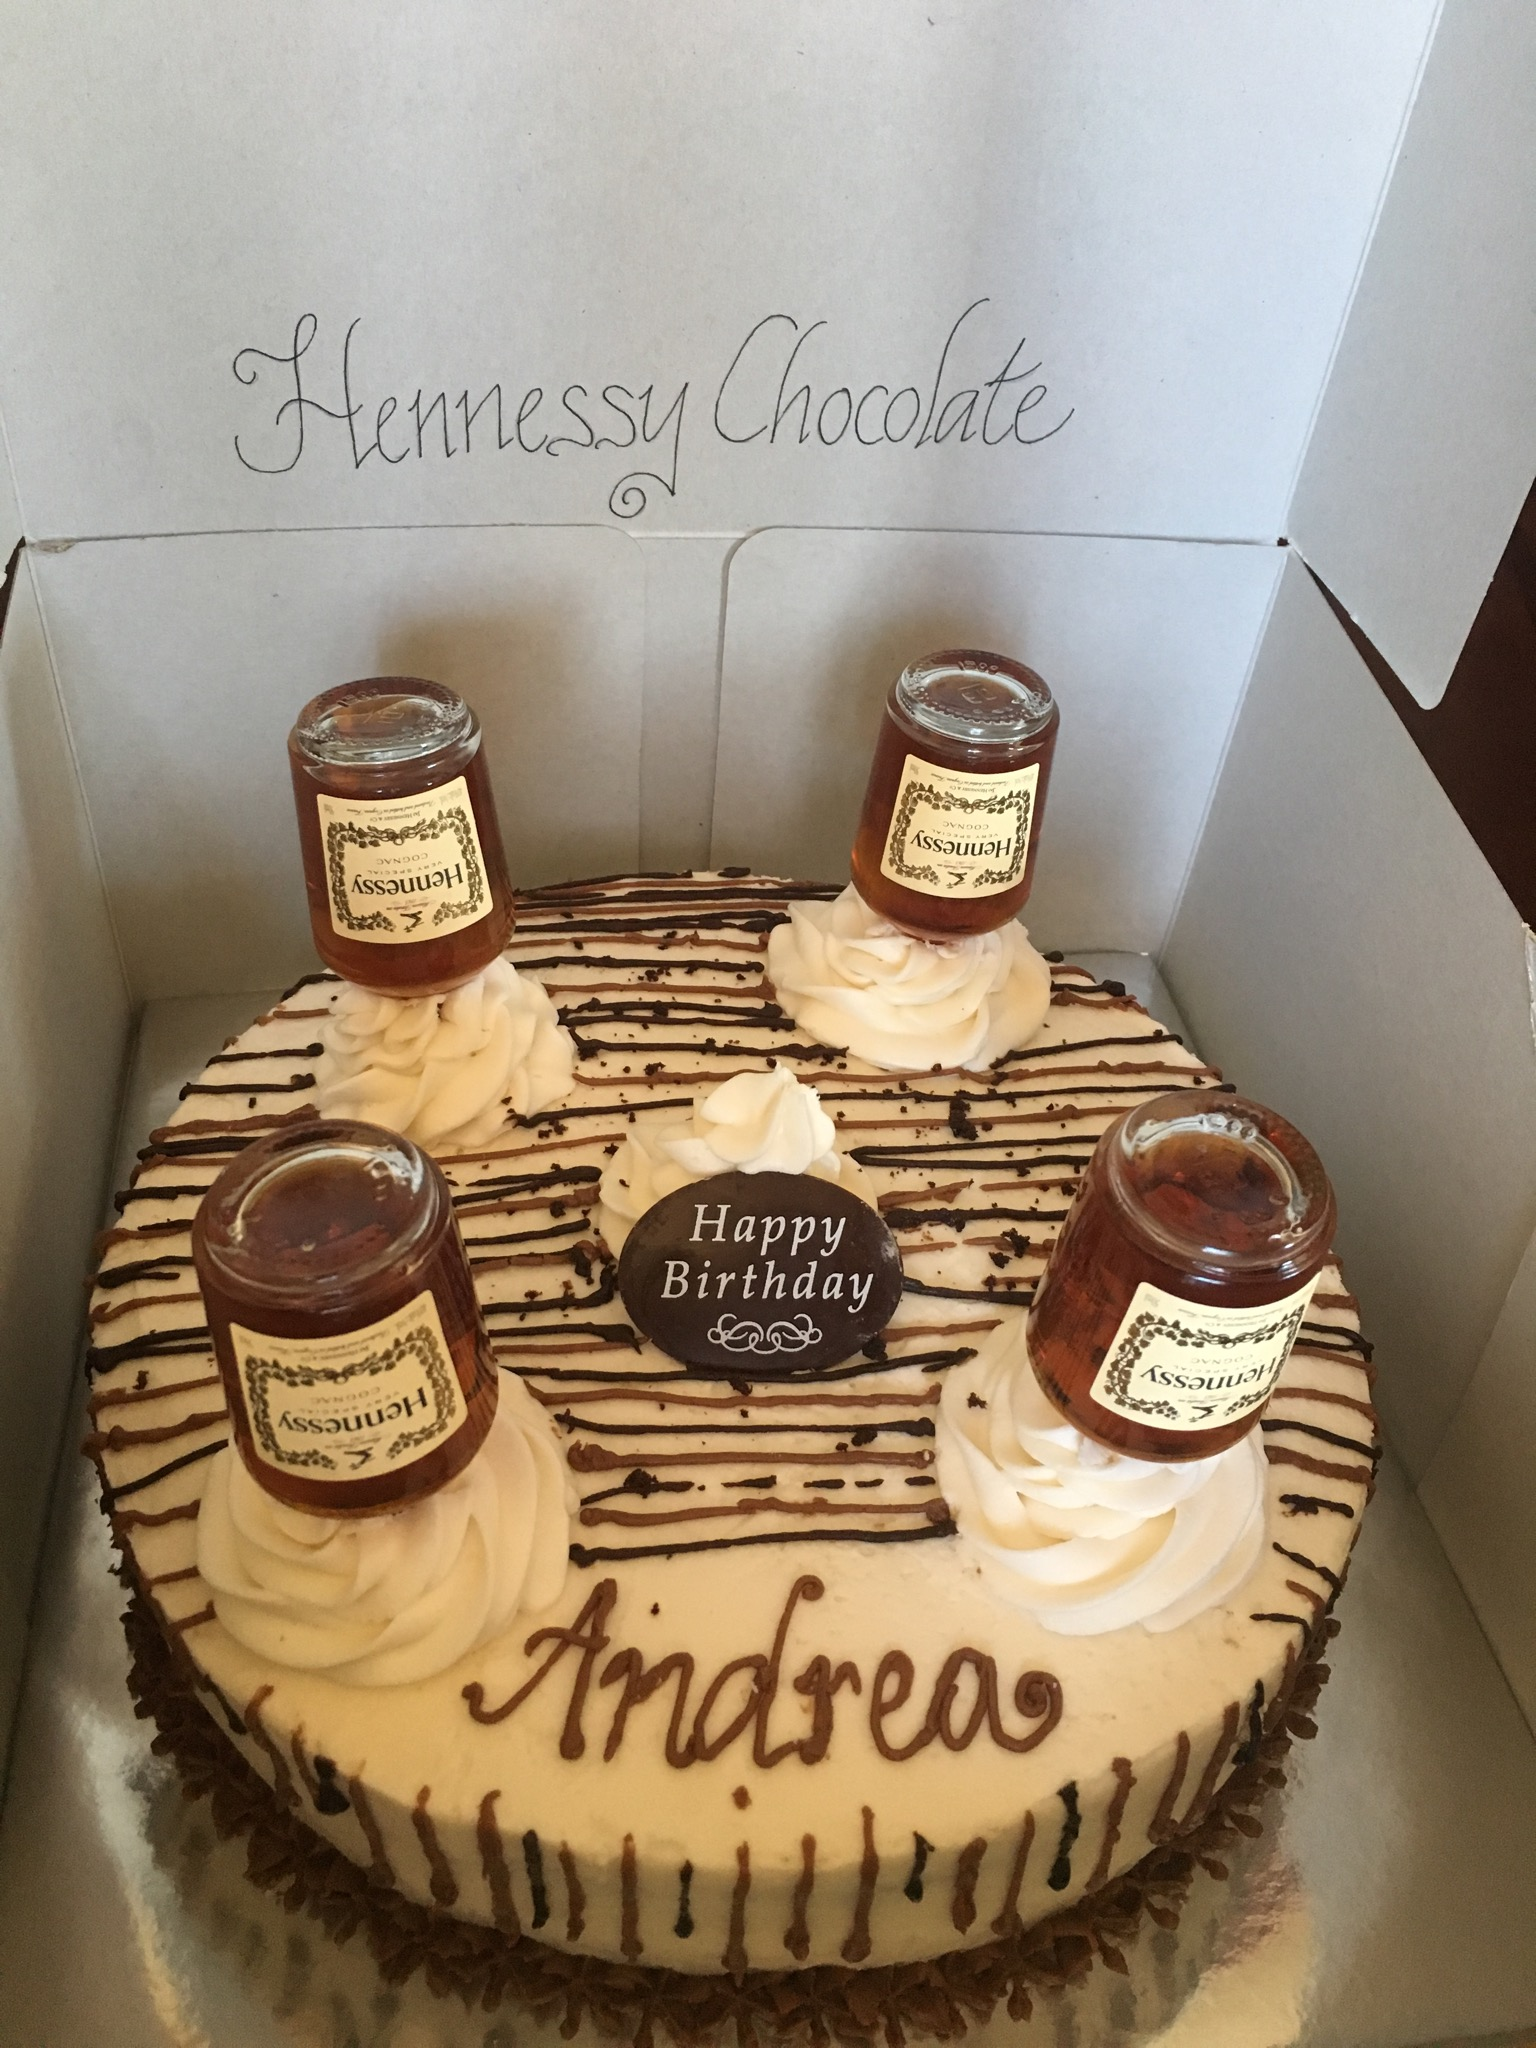 Peachy Hennessycustom Bottle Cake Wasted Desserts Funny Birthday Cards Online Alyptdamsfinfo